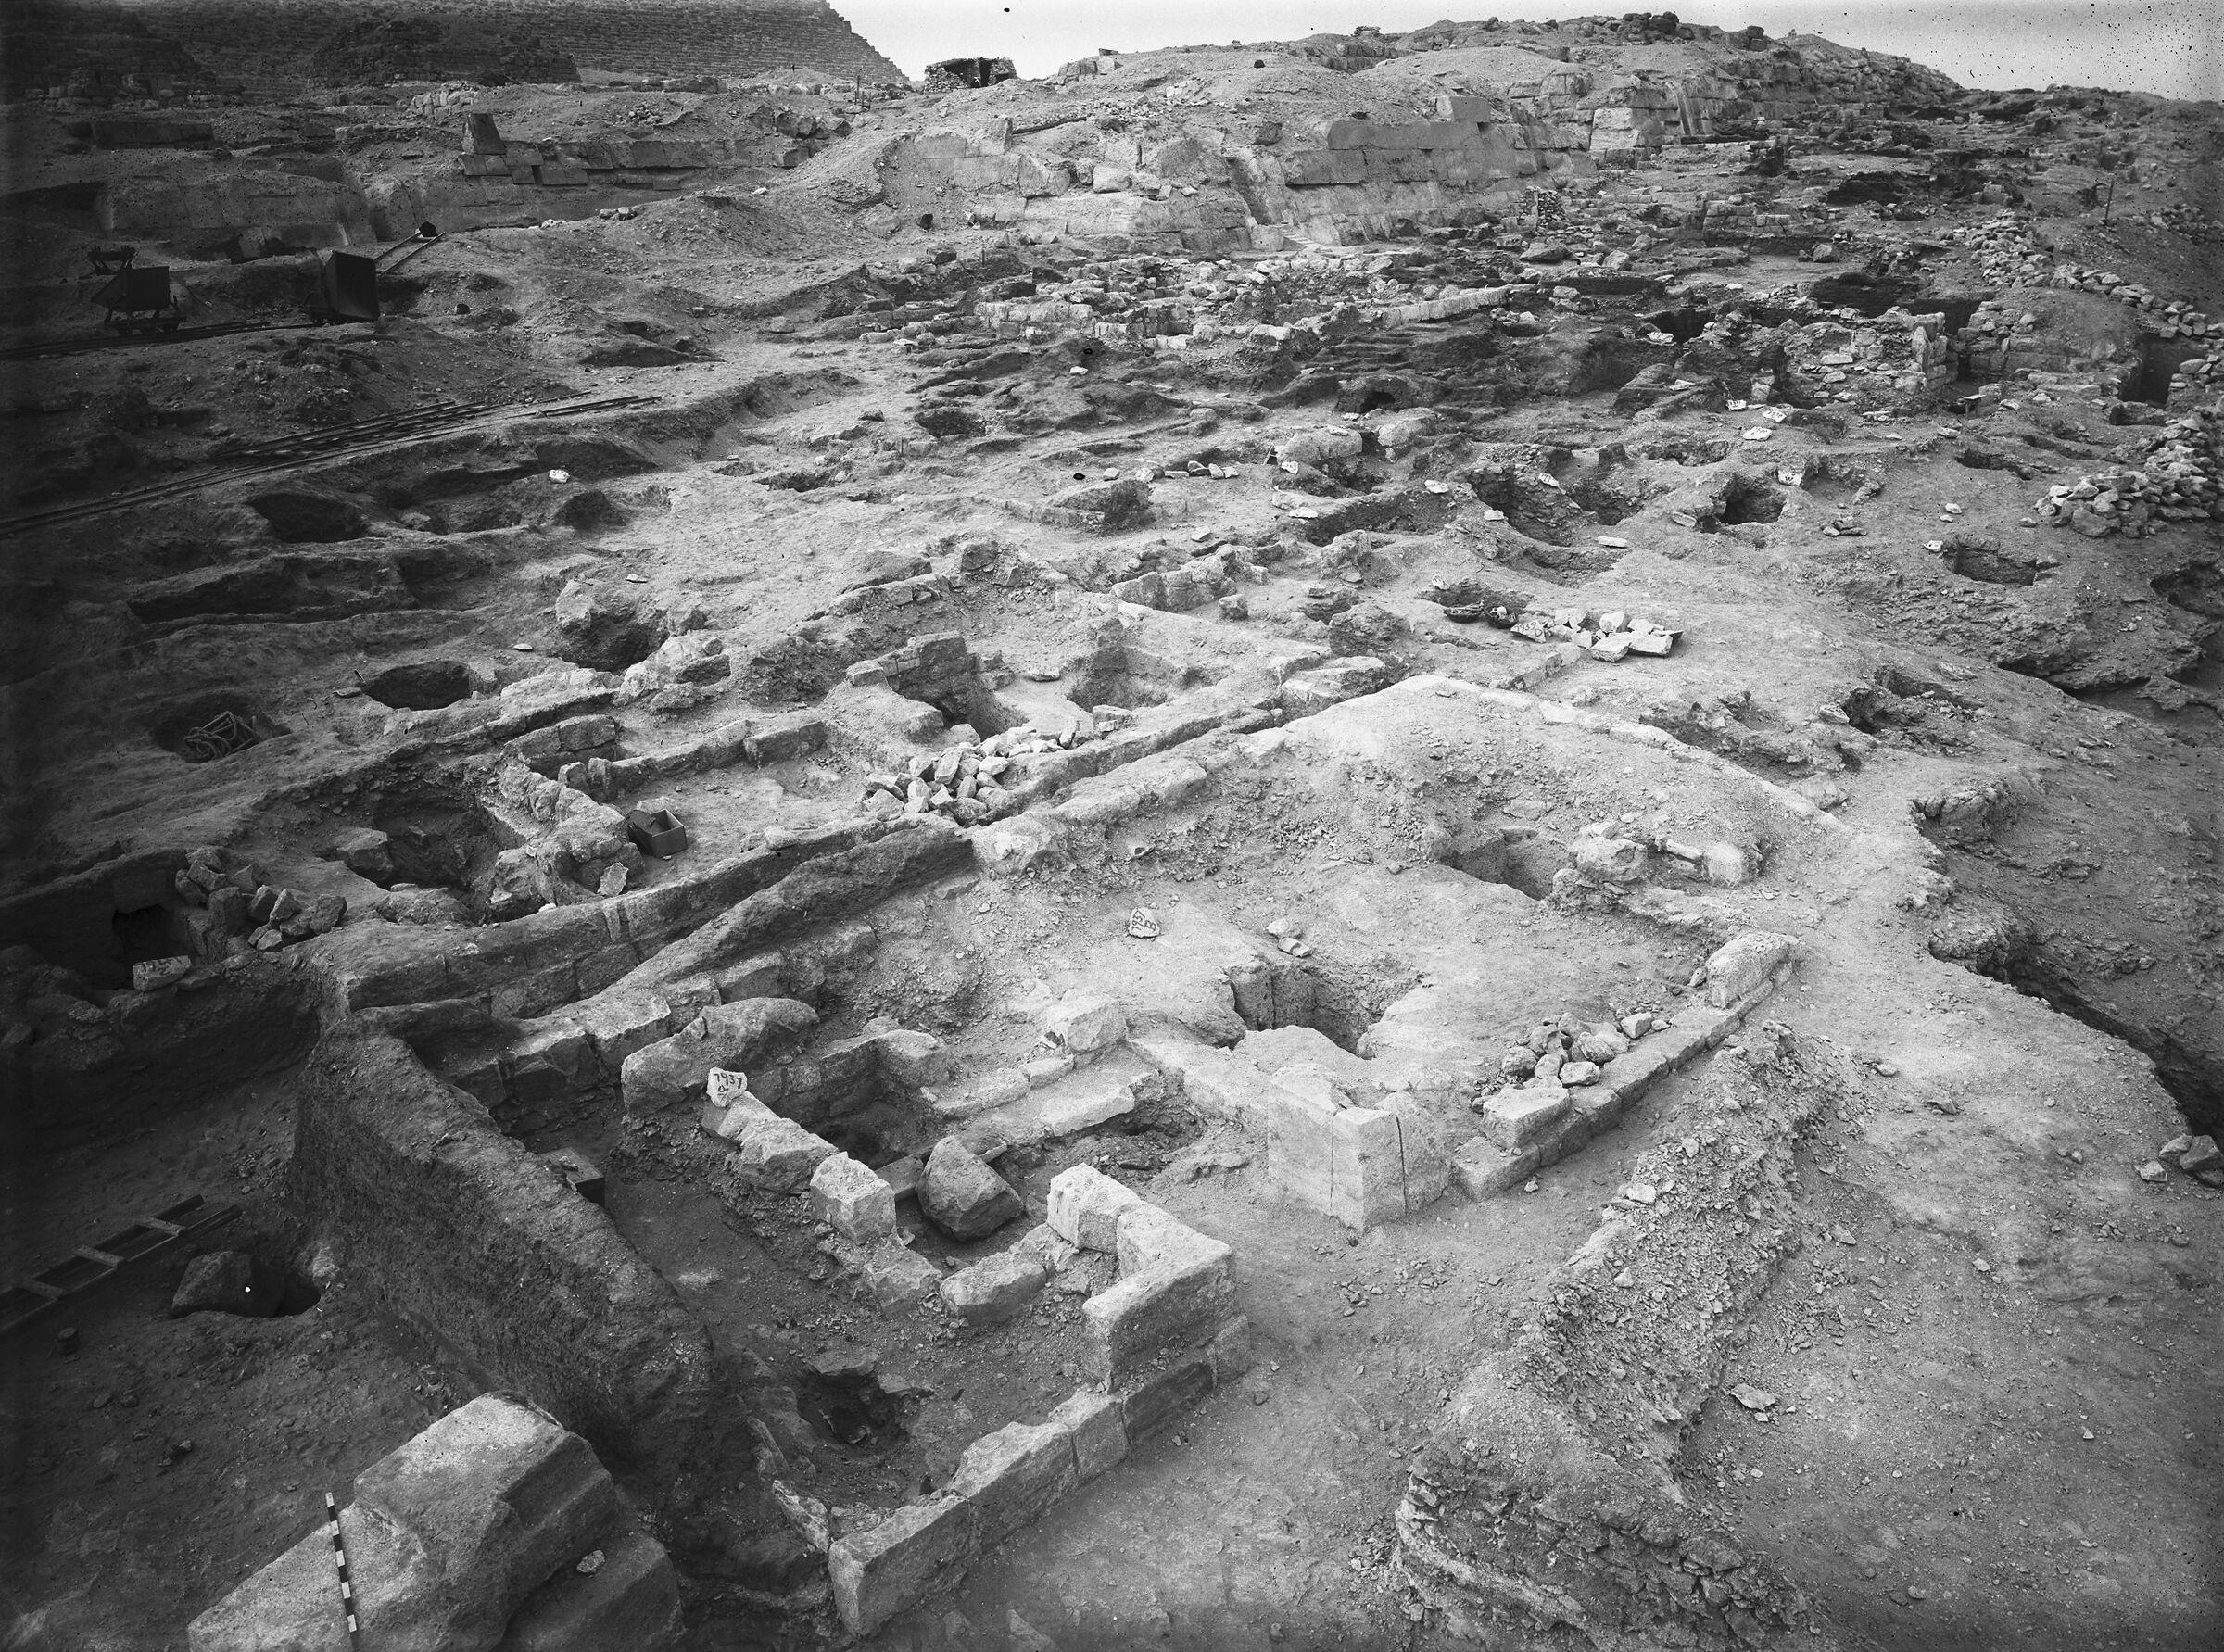 Eastern Cemetery: Site: Giza; View: G 7937, G 7936, G 7943, G 7934, G 7935, G 7912, G 7911, G 7760, G 7660